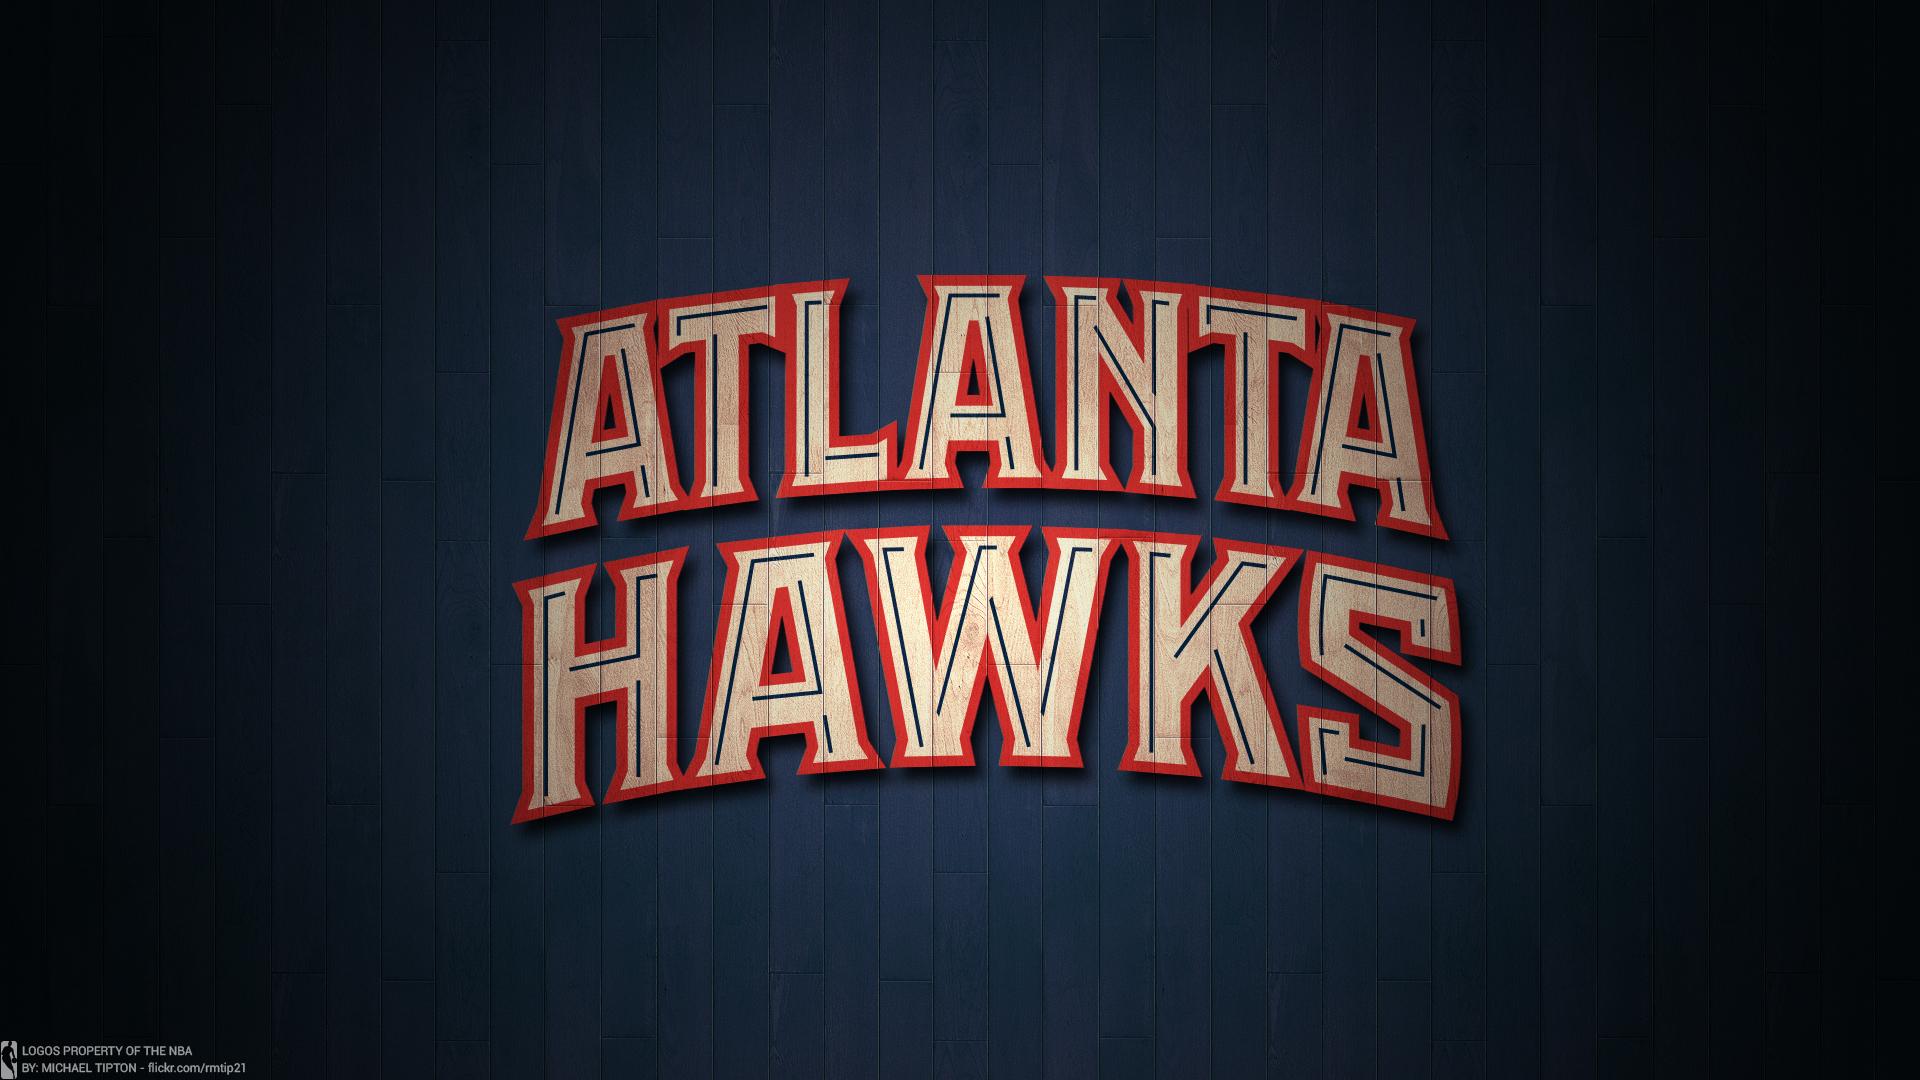 Atlanta Hawks Basketball Team Fondo De Pantalla Hd Fondo